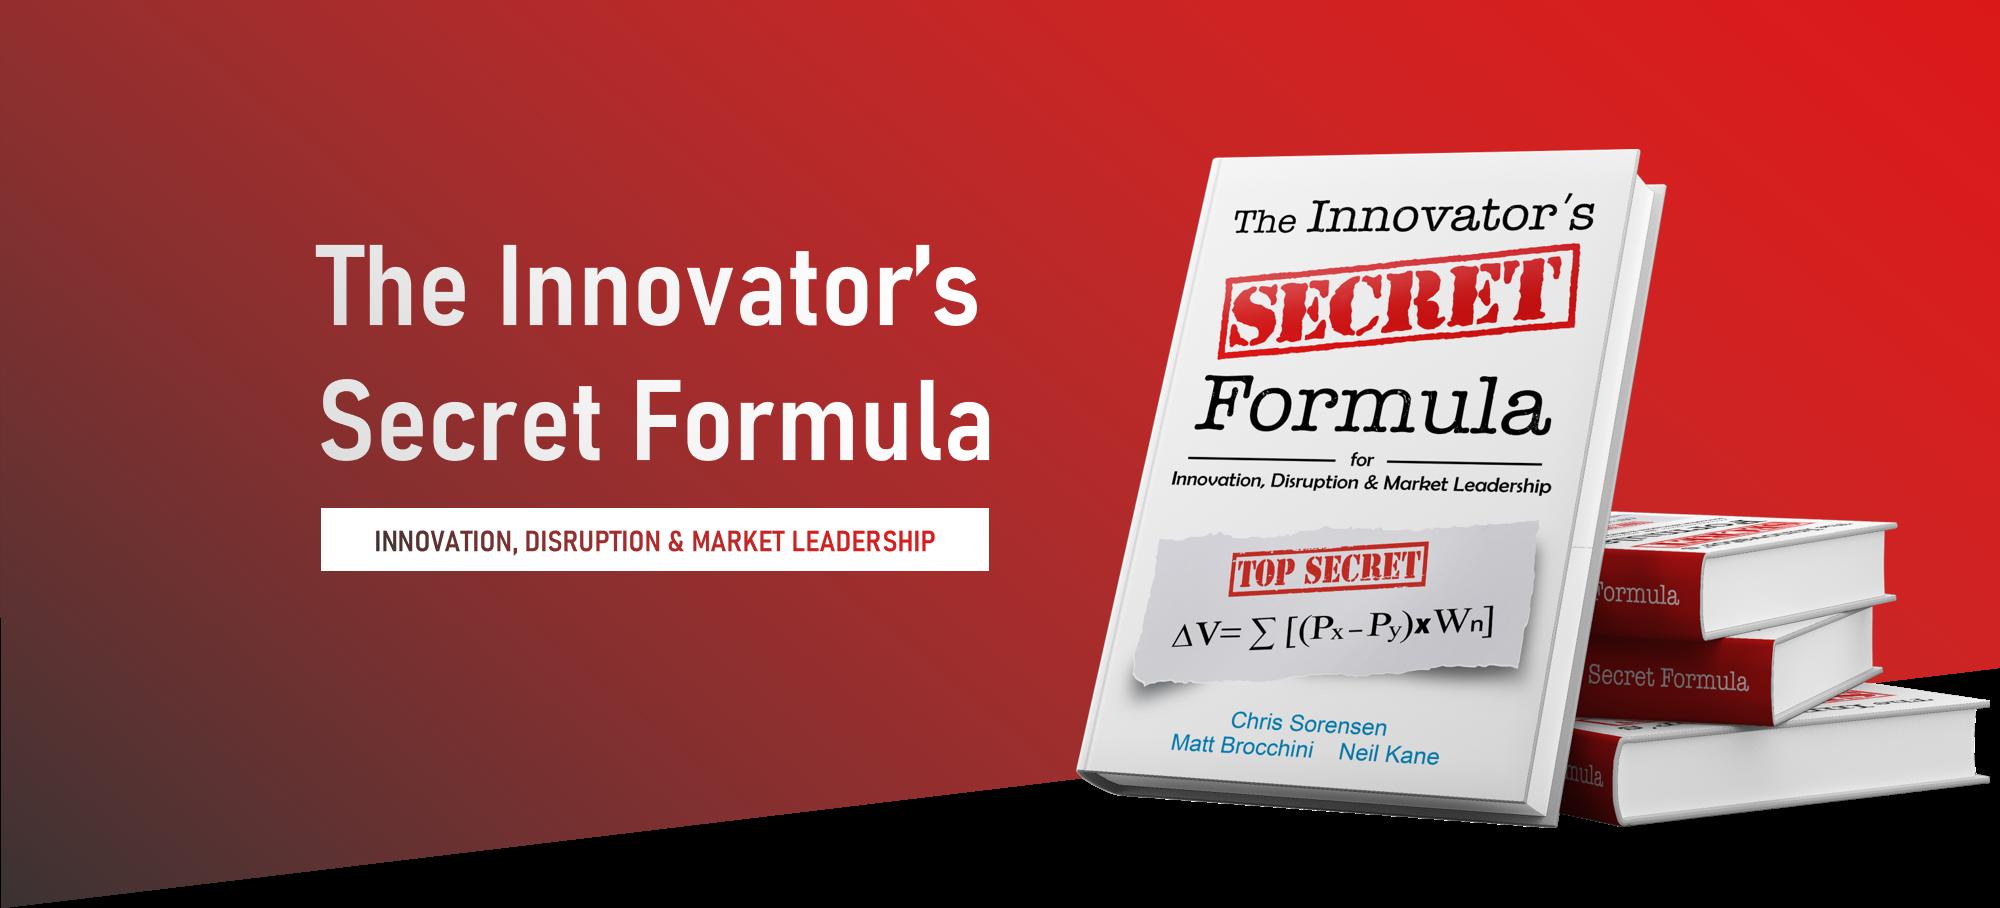 The Innovator's Secret Formula